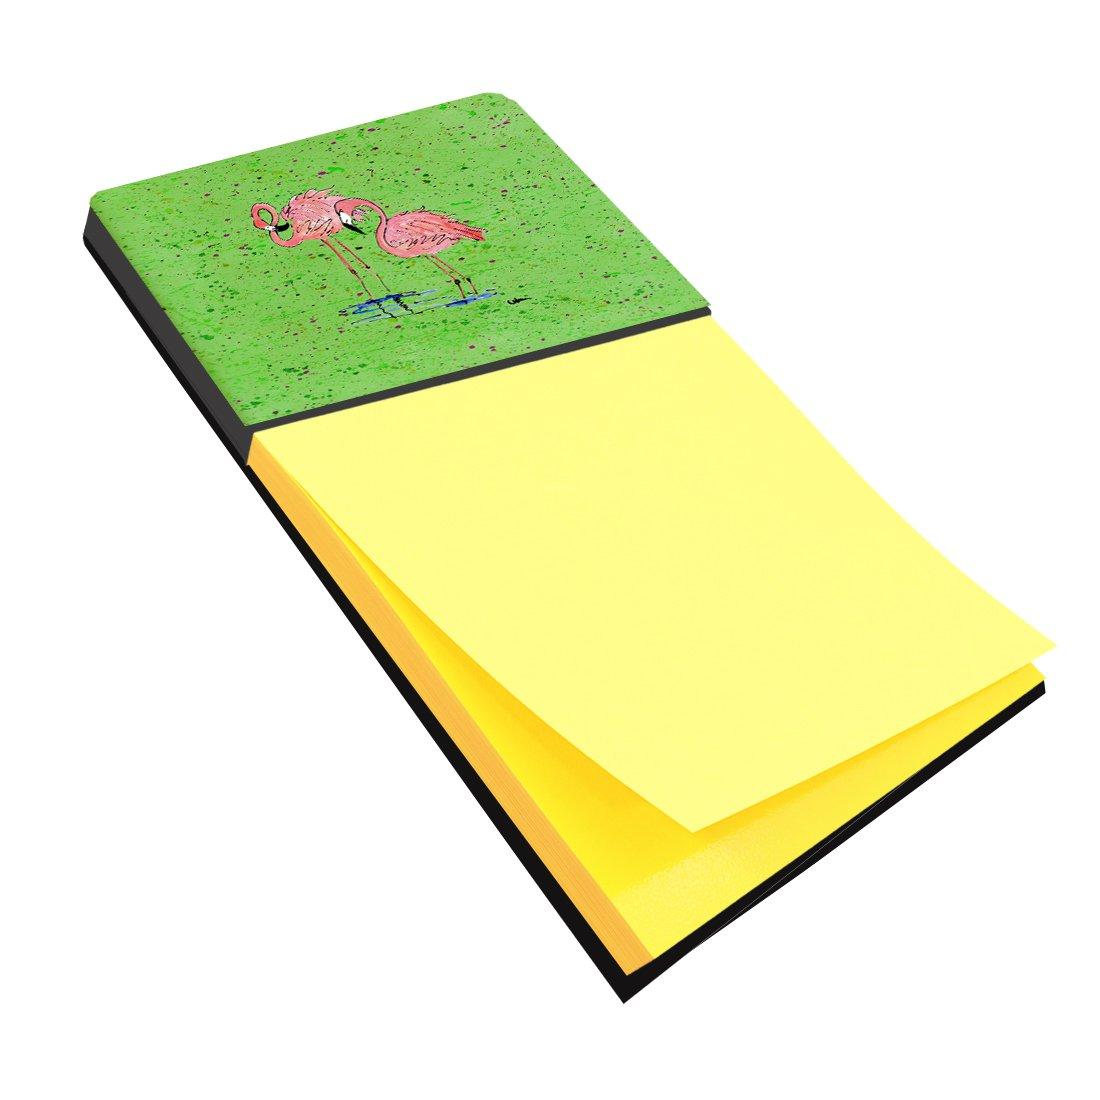 Caroline's Treasures 8567SN Flamingo Refiillable Sticky Note Holder or Postit Note Dispenser, Large, Multicolor